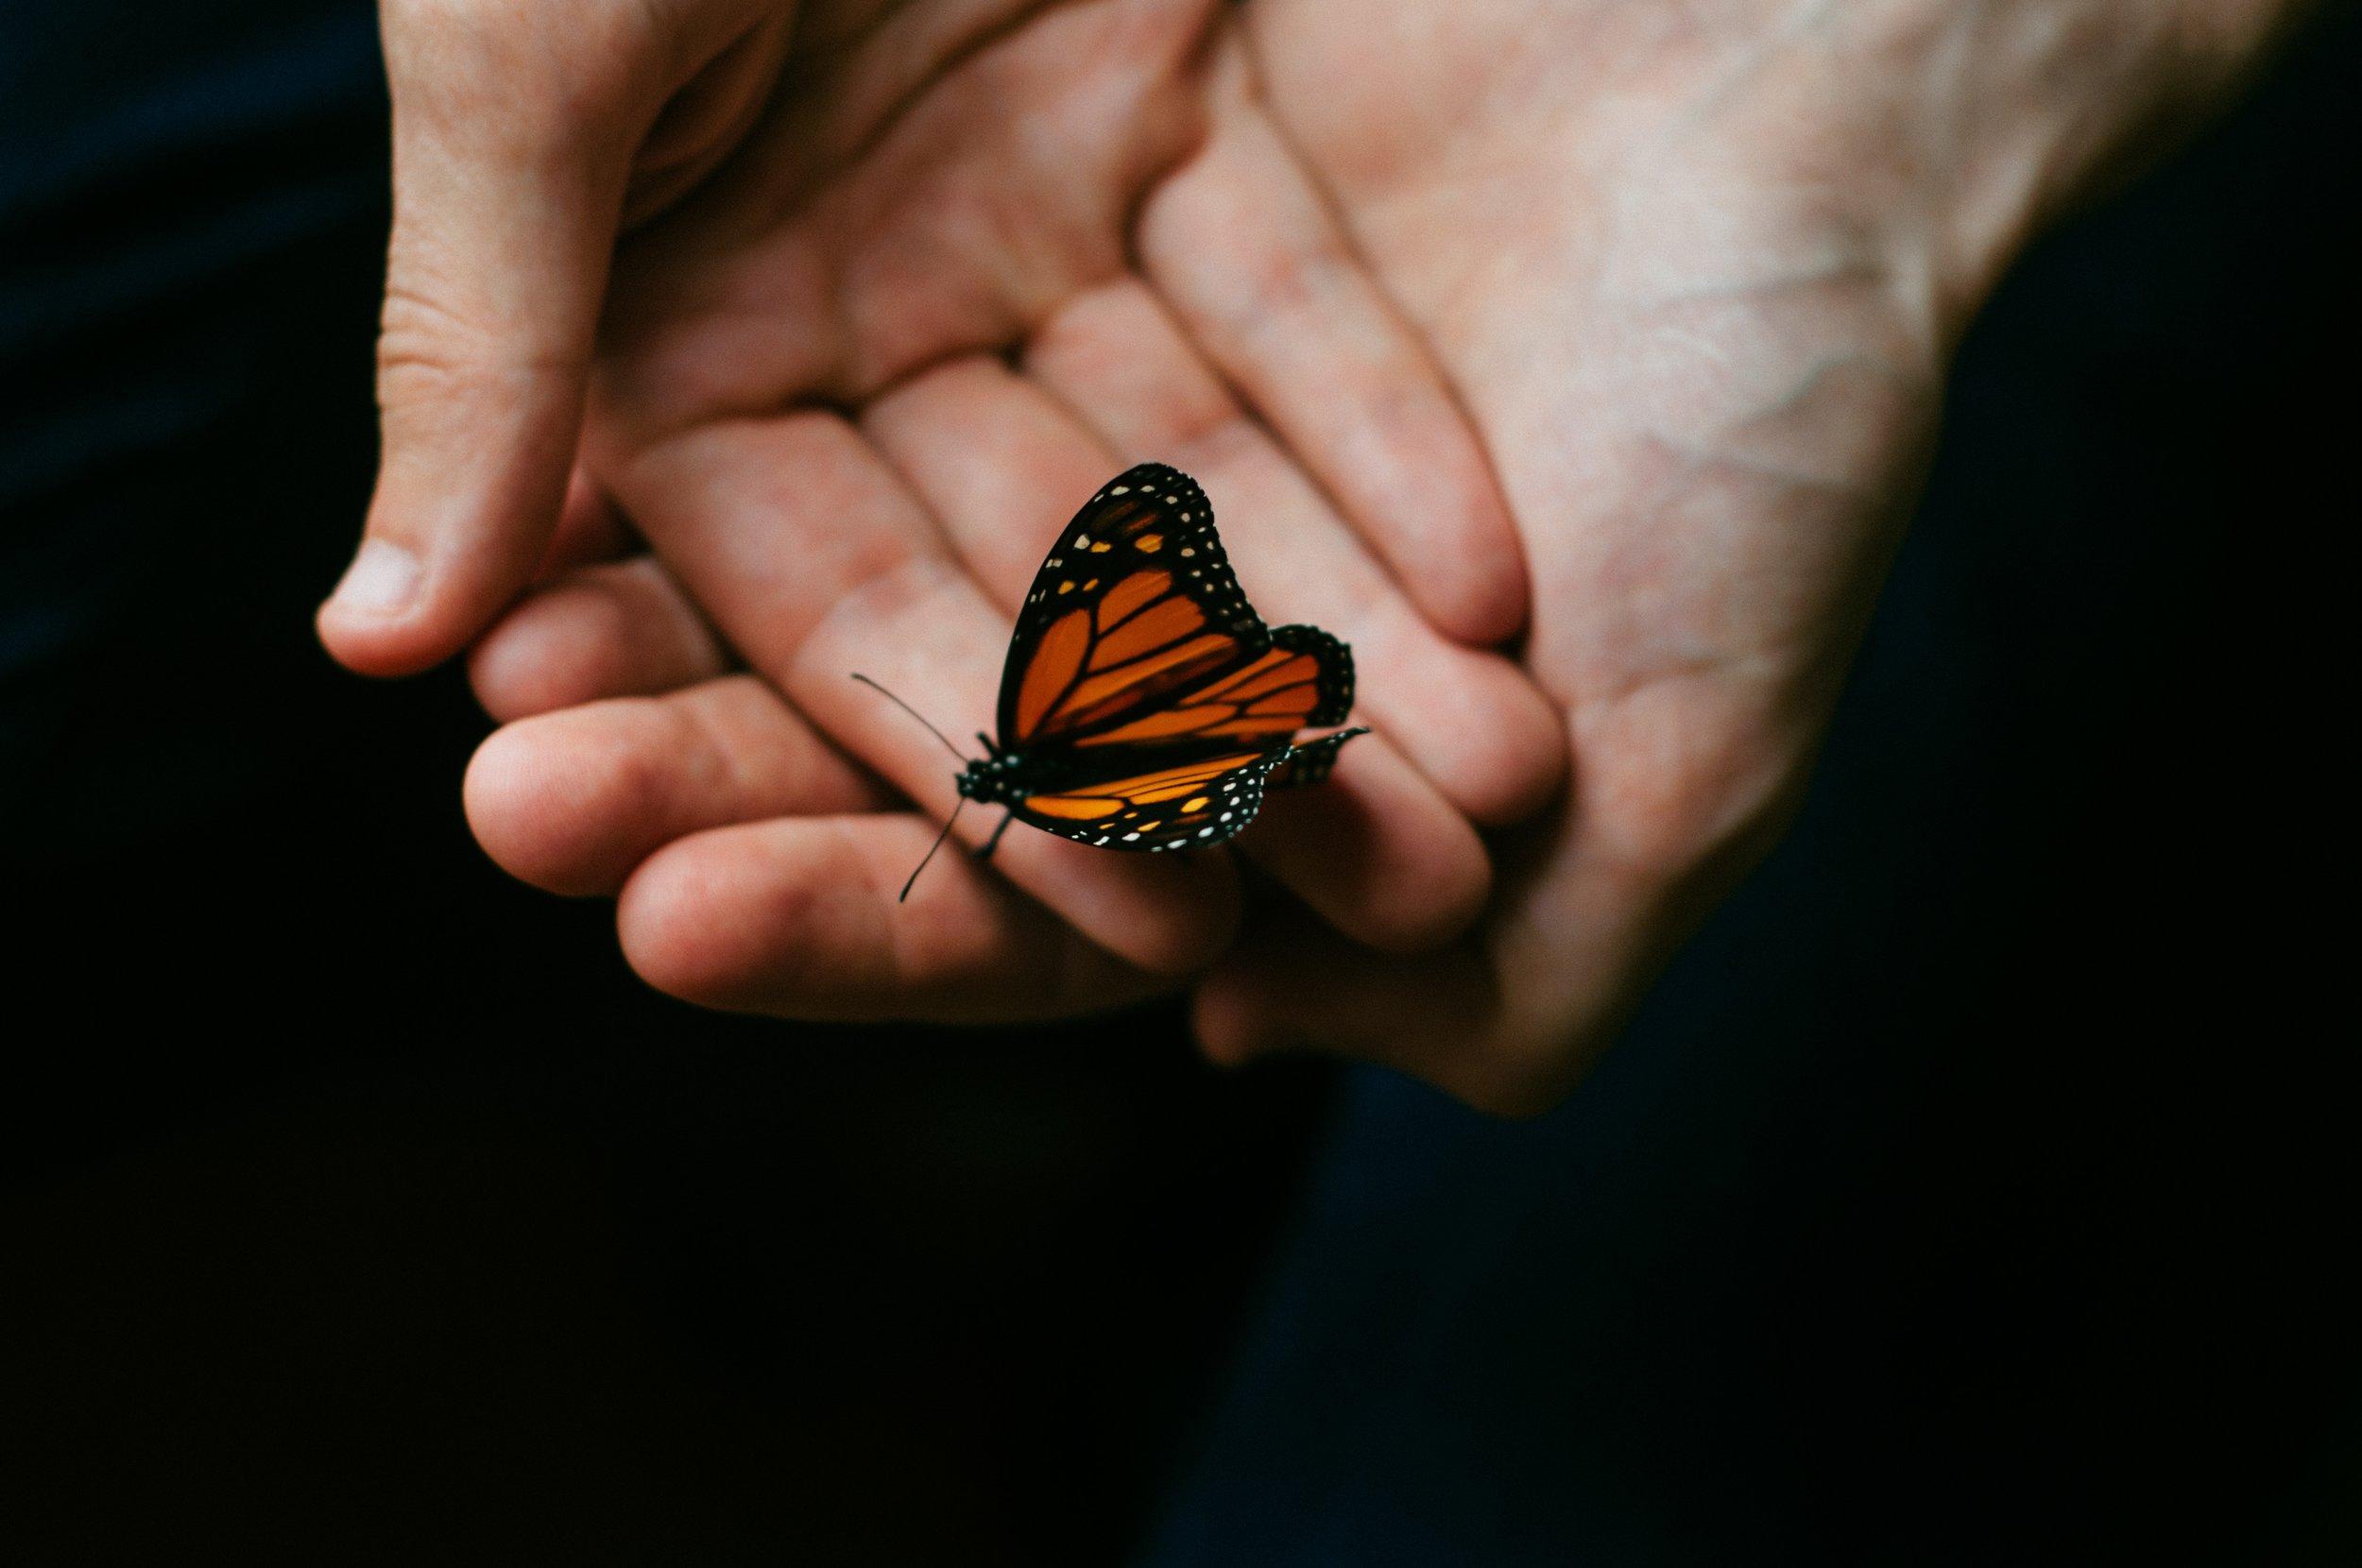 Monarch-butterfly-garden-supply-company.jpg